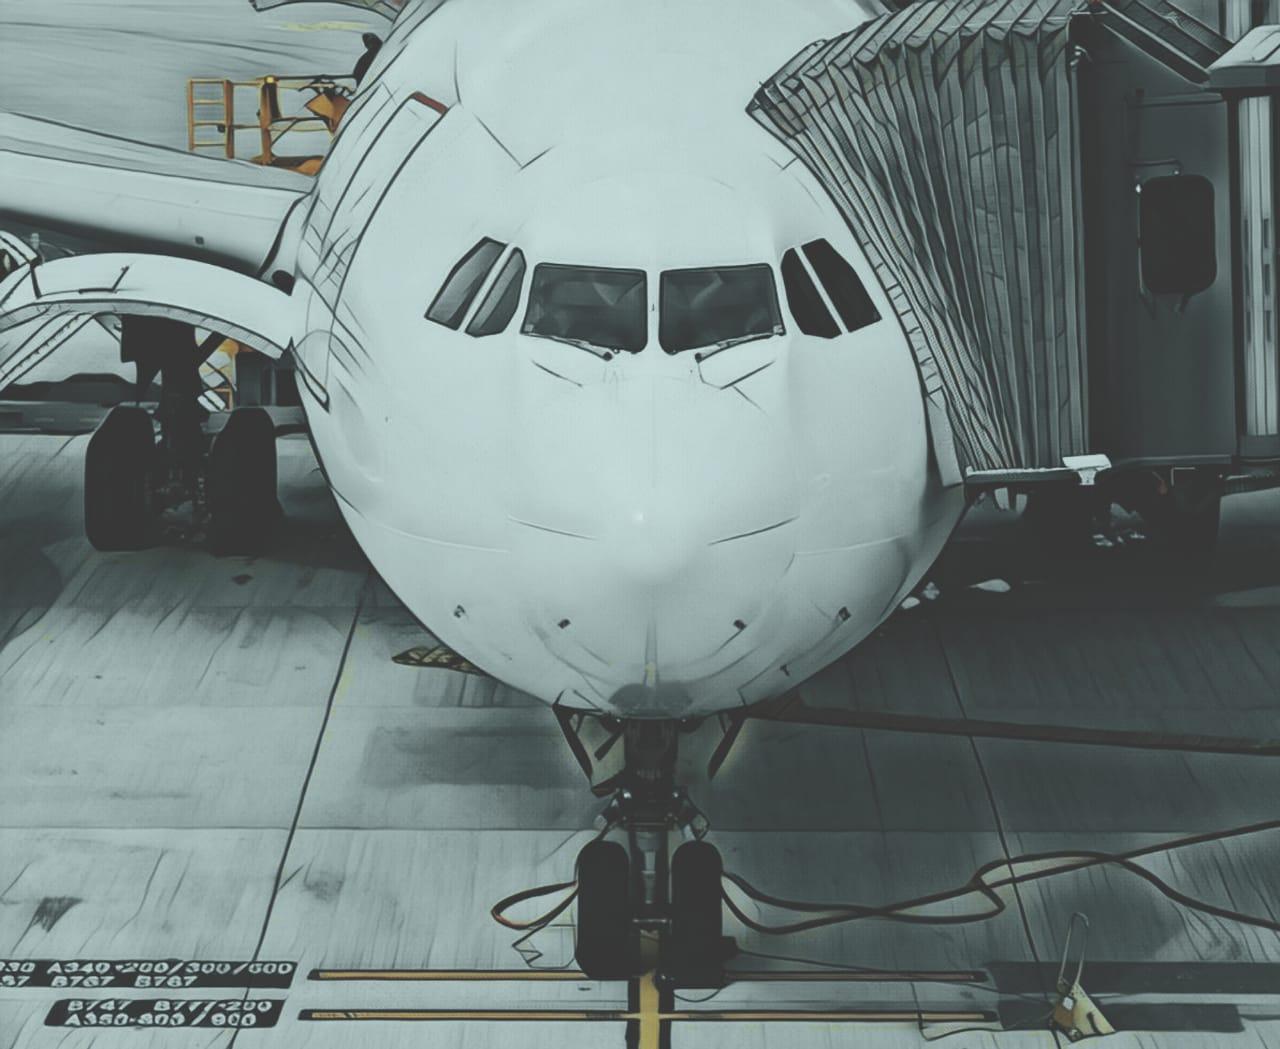 https: img.okezone.com content 2020 10 31 620 2302134 4-fakta-stimulus-subsidi-bagi-industri-penerbangan-G0mSDZbkjX.jpeg